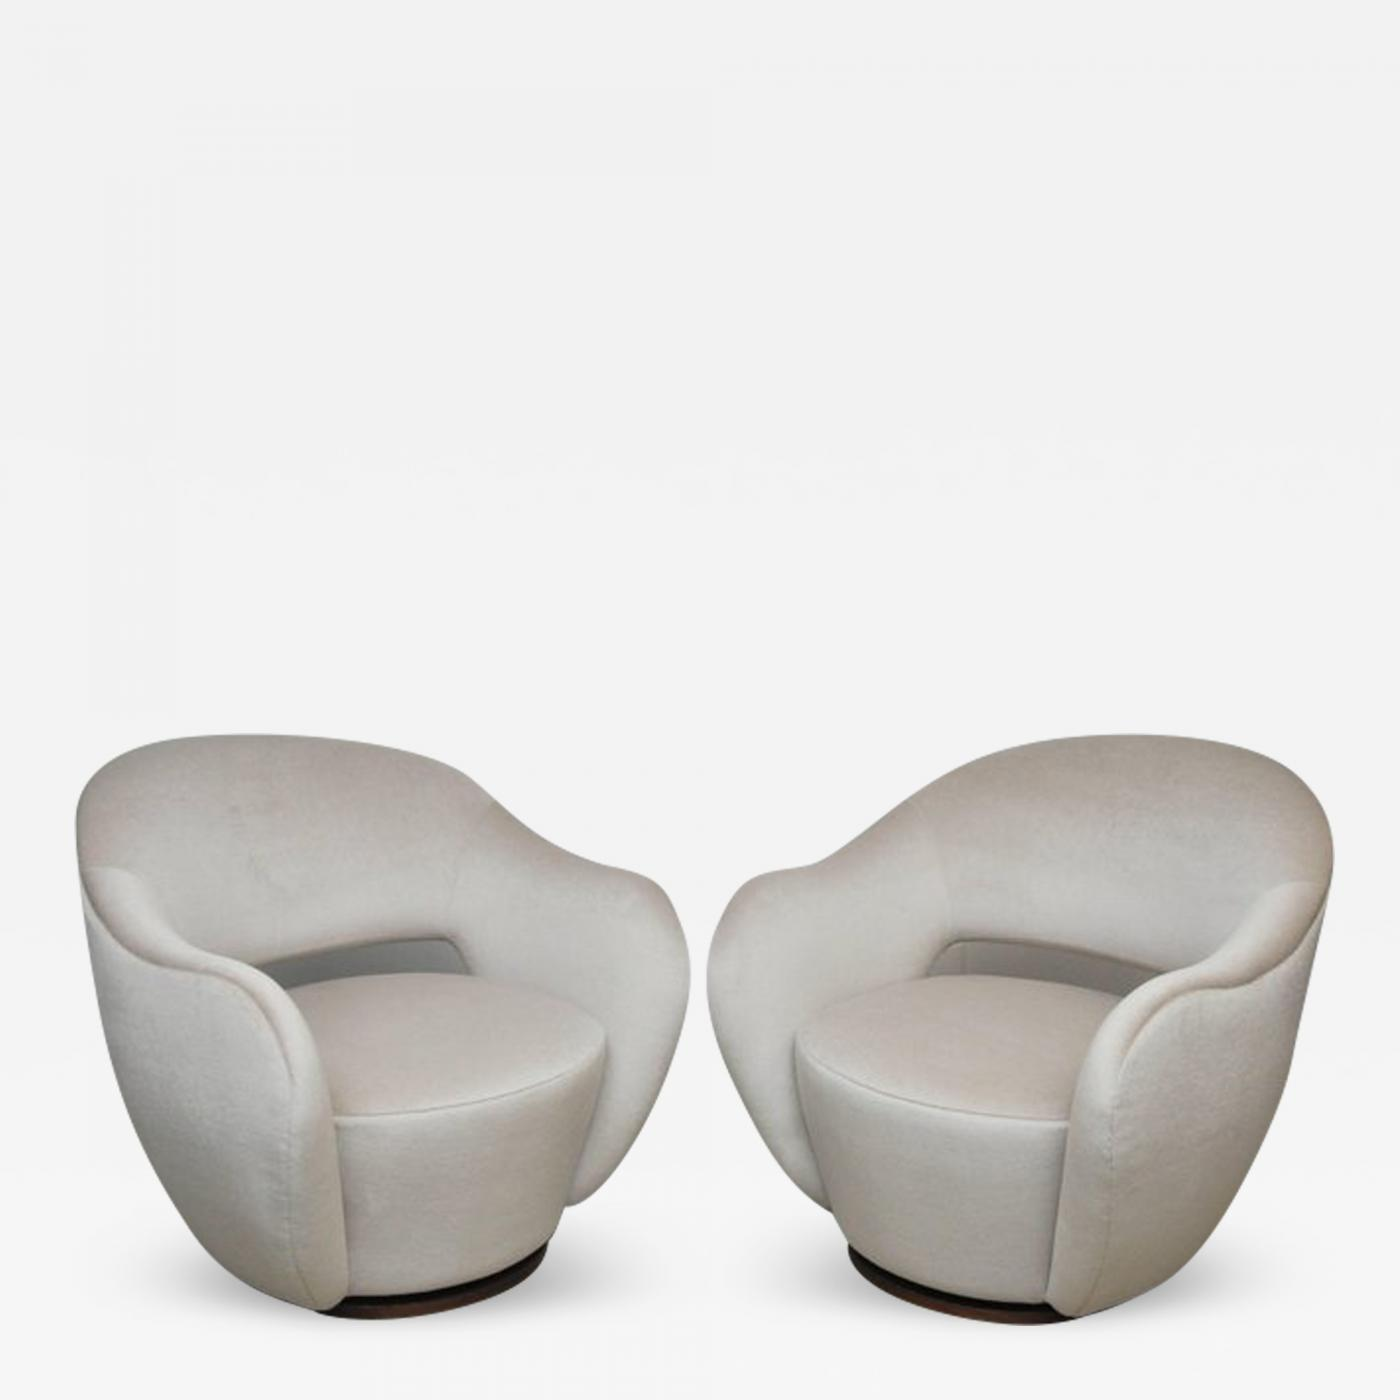 Merveilleux Listings / Furniture / Seating / Club Chairs